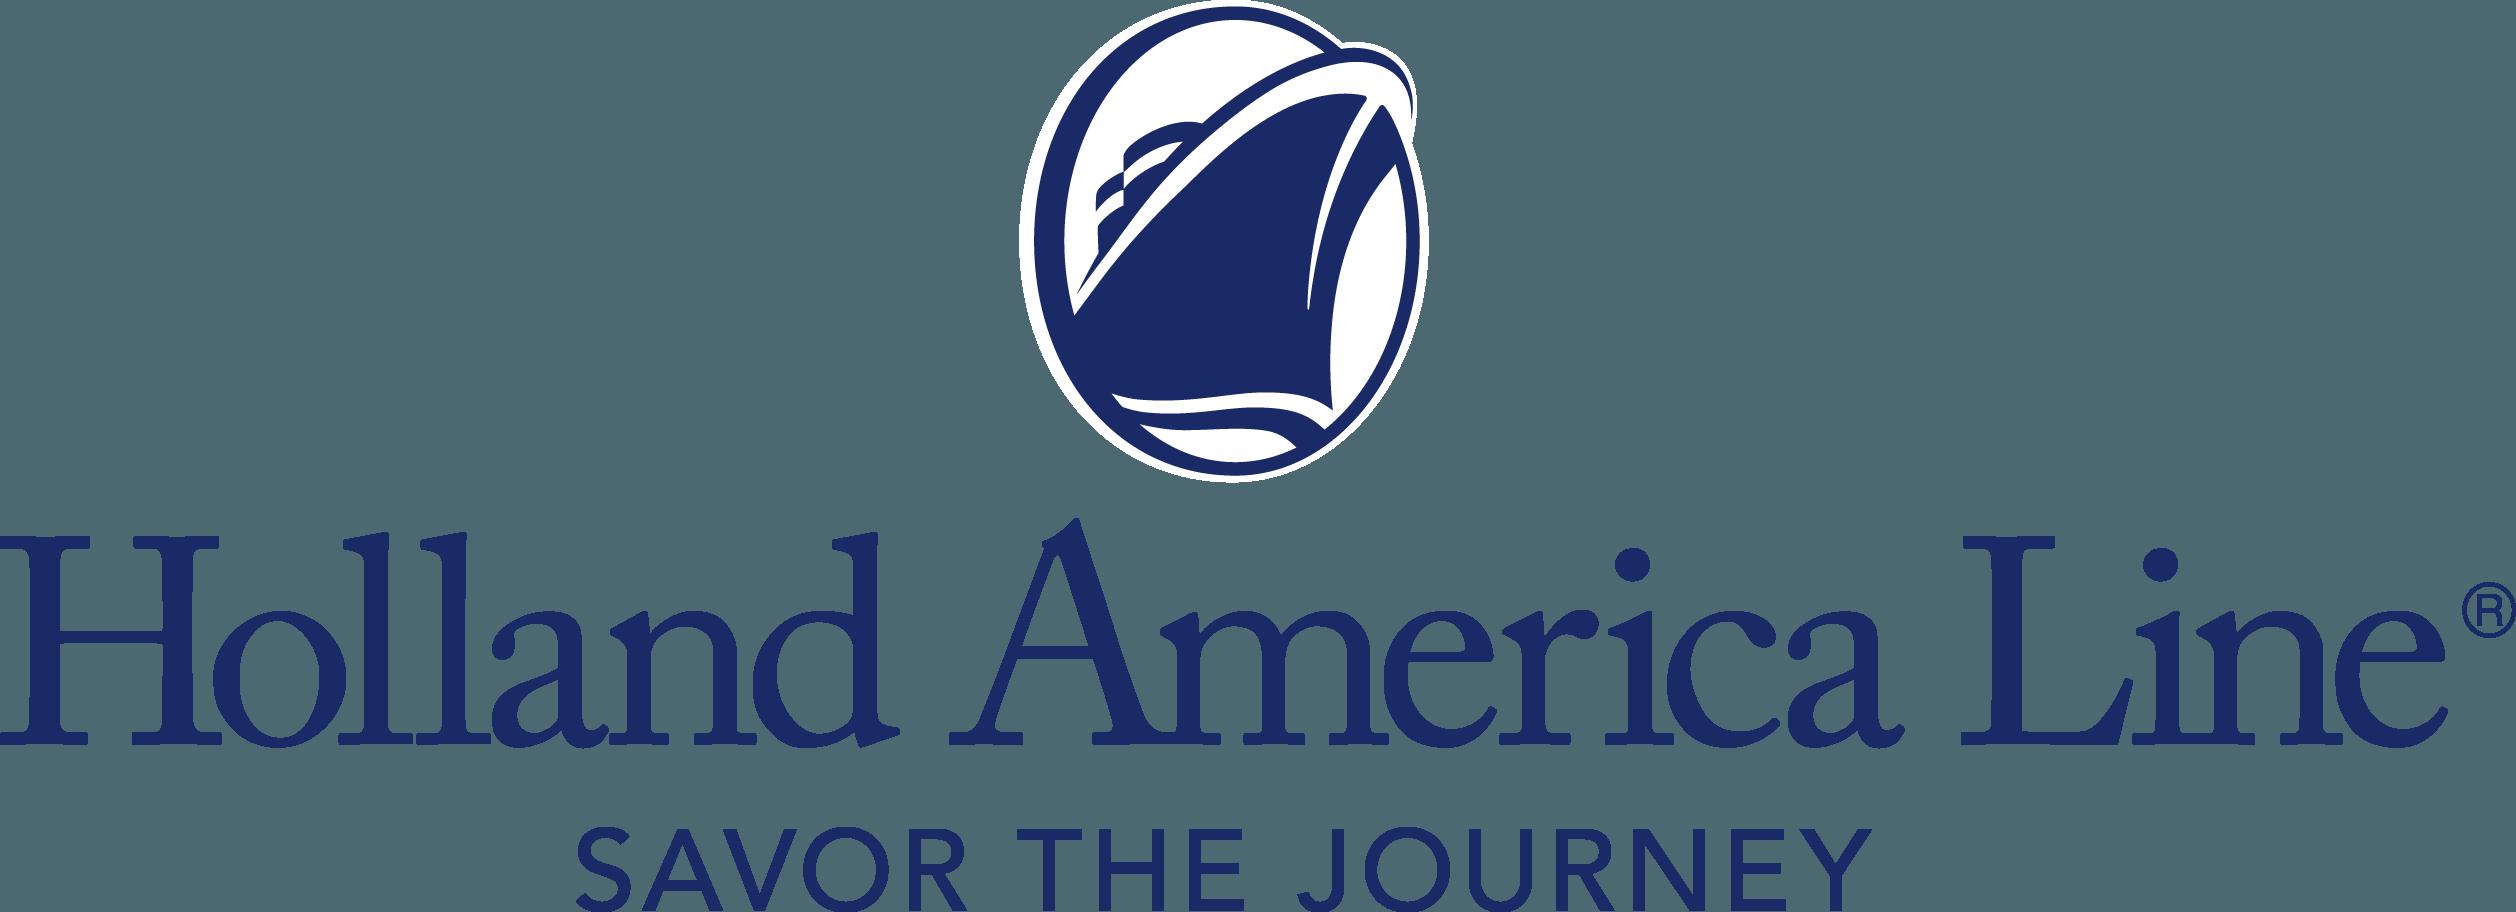 Holland America Line Logo png